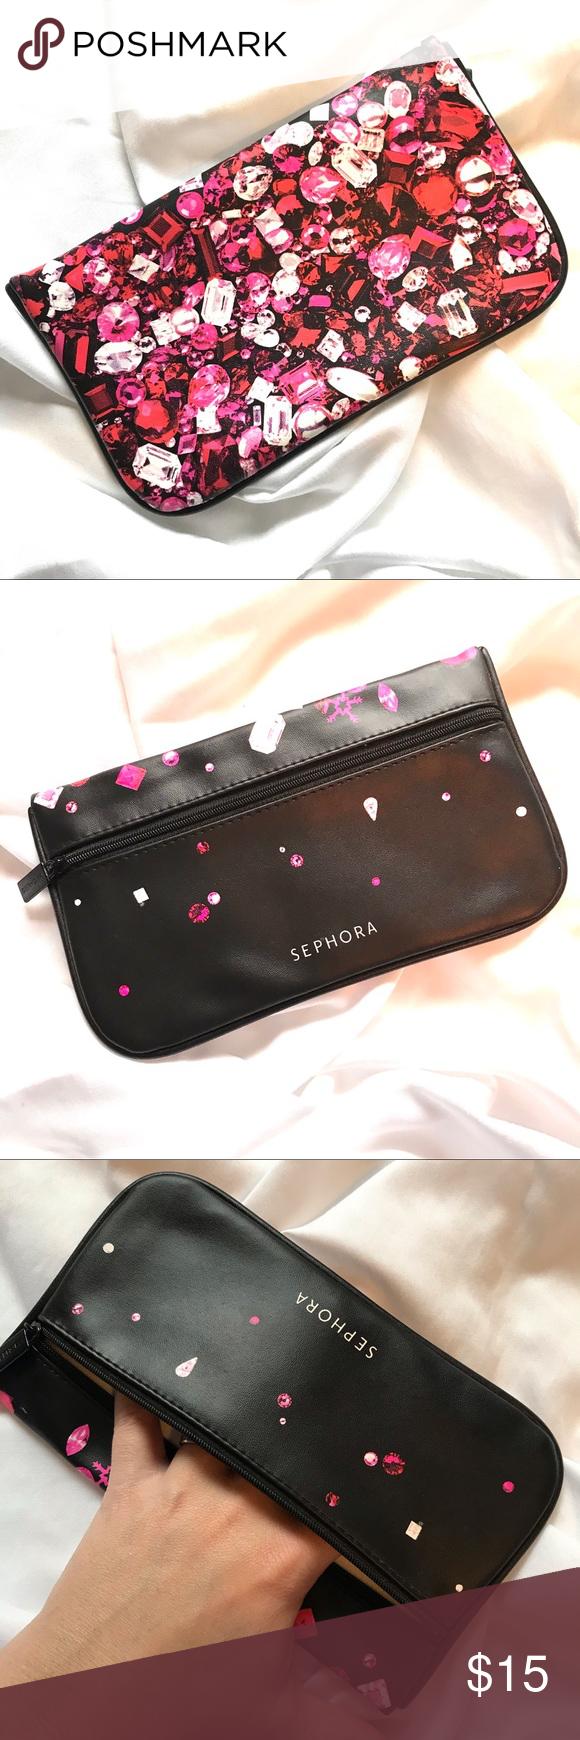 5/25 Sephora Makeup Bag Travel Zipper Brand New NWT (With